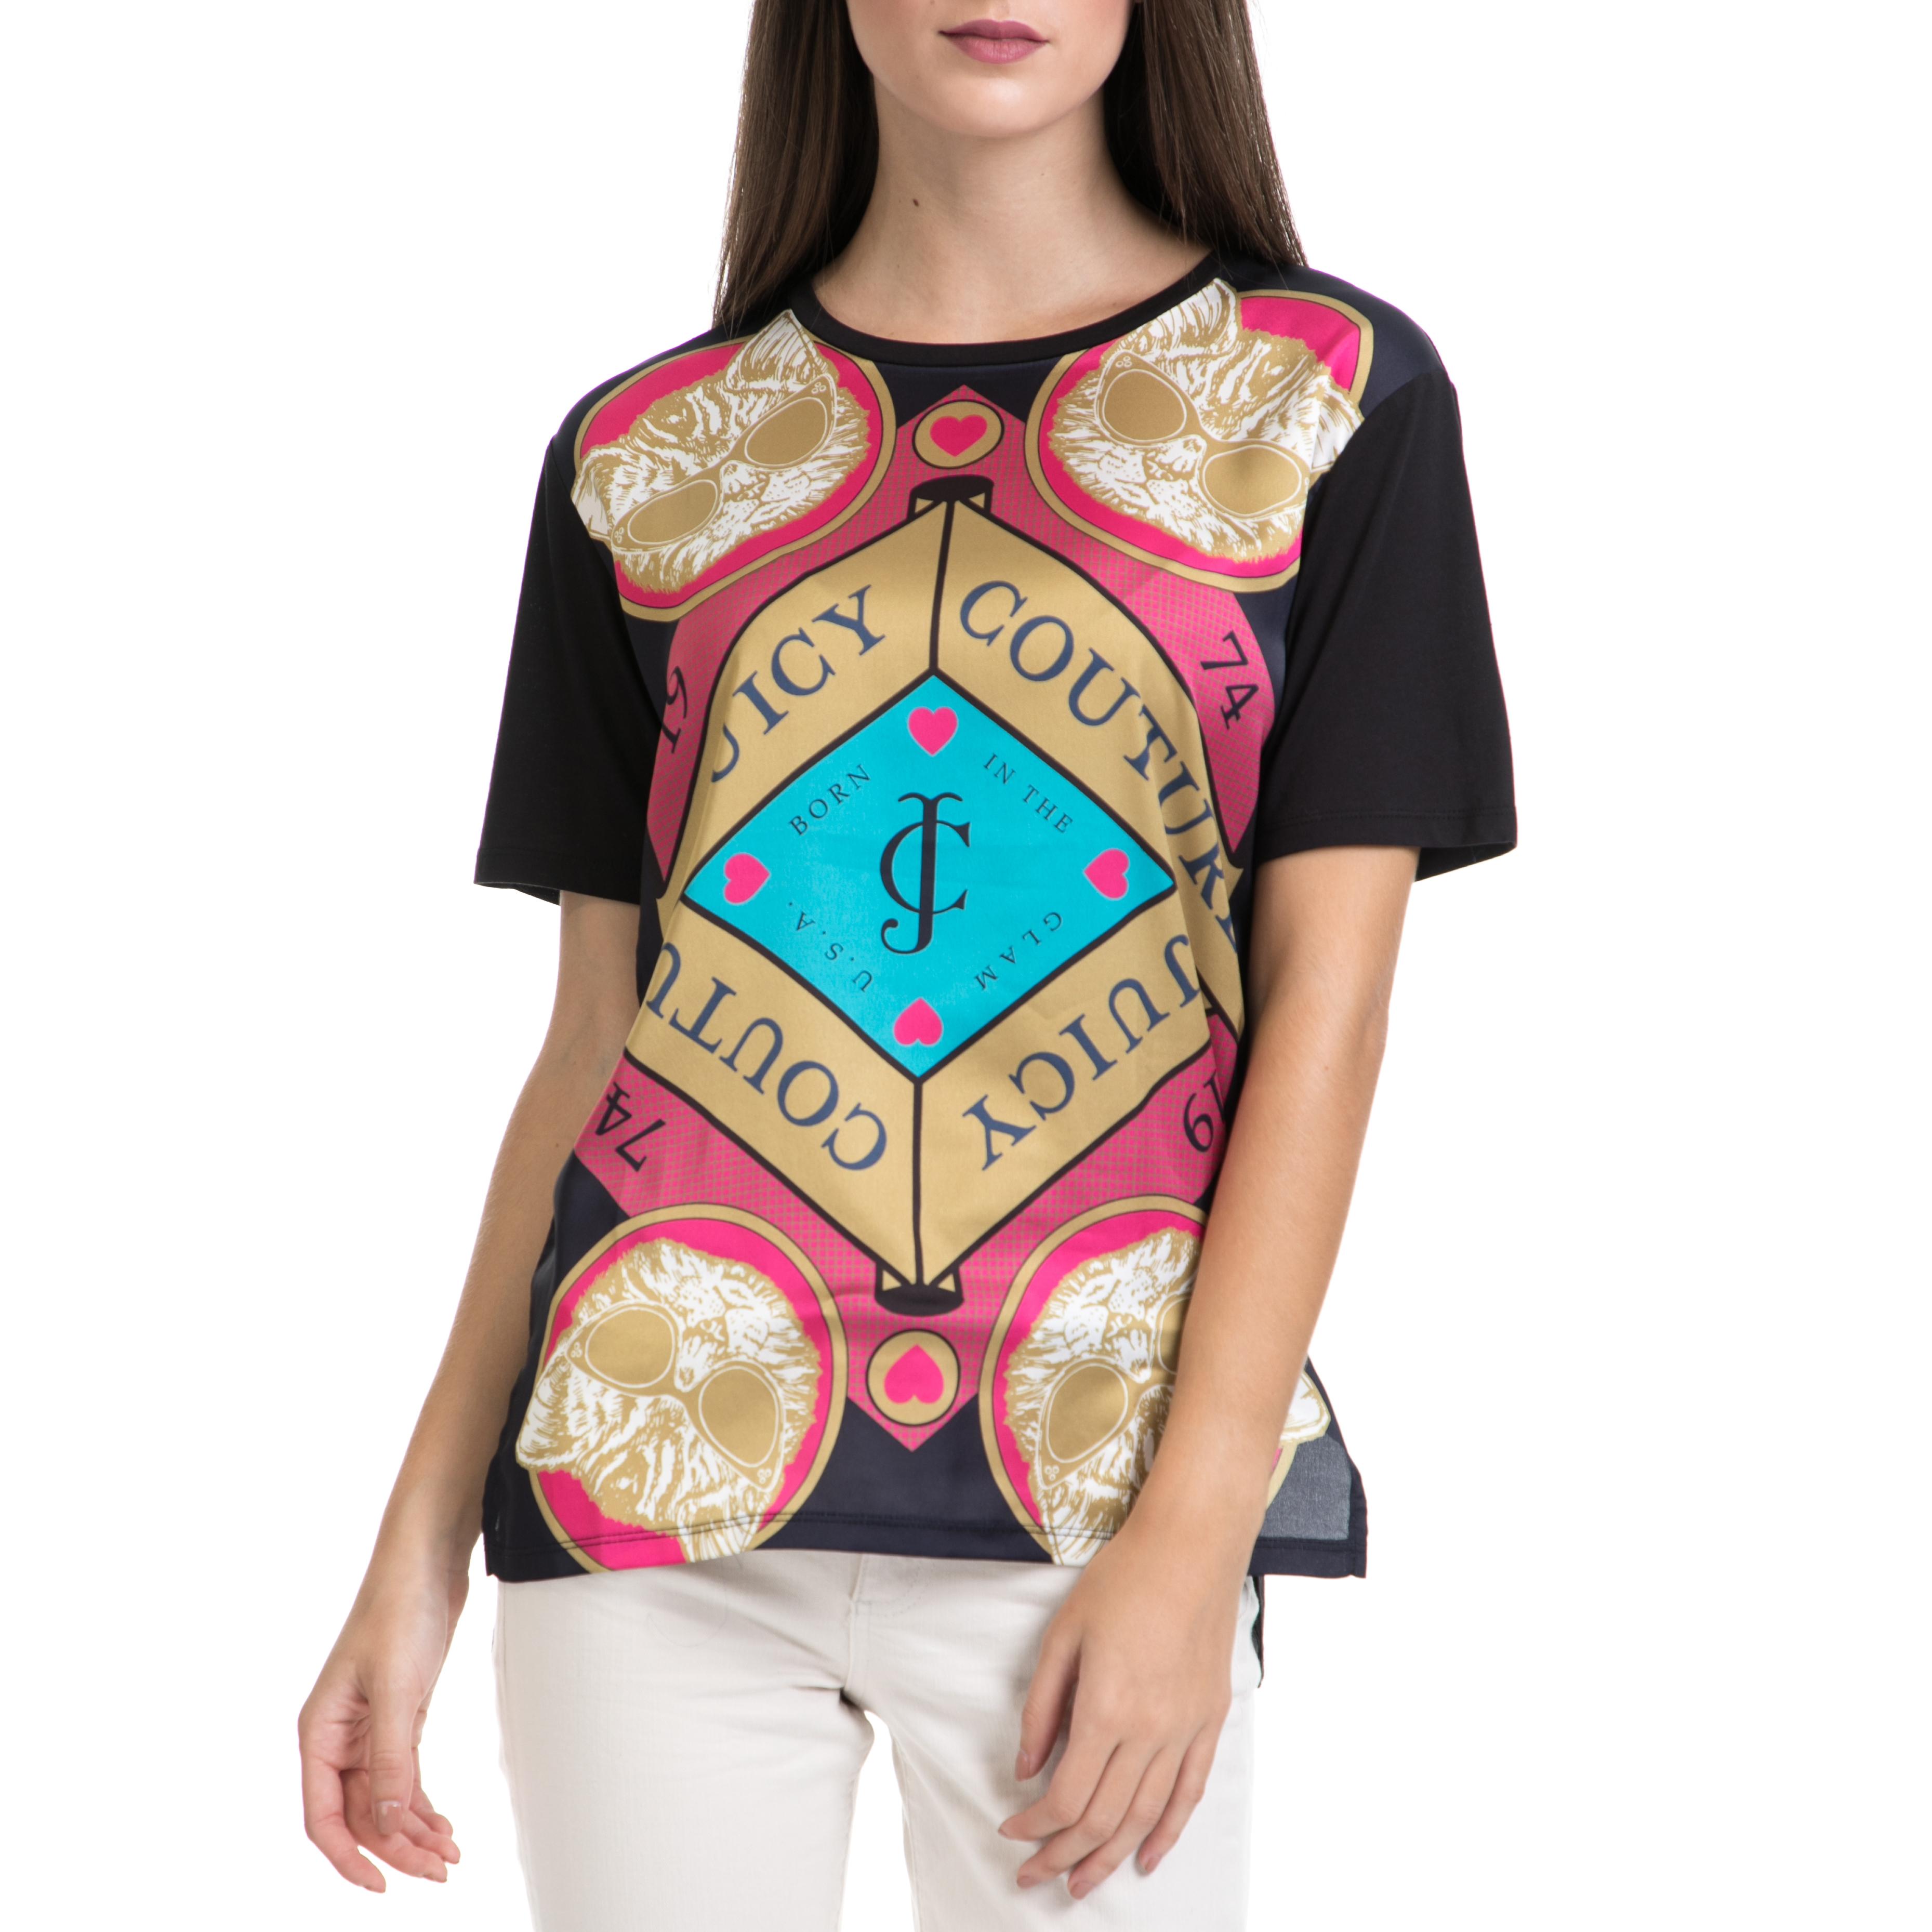 JUICY COUTURE - Γυναικεία μπλούζα JUICY COUTURE εμπριμέ